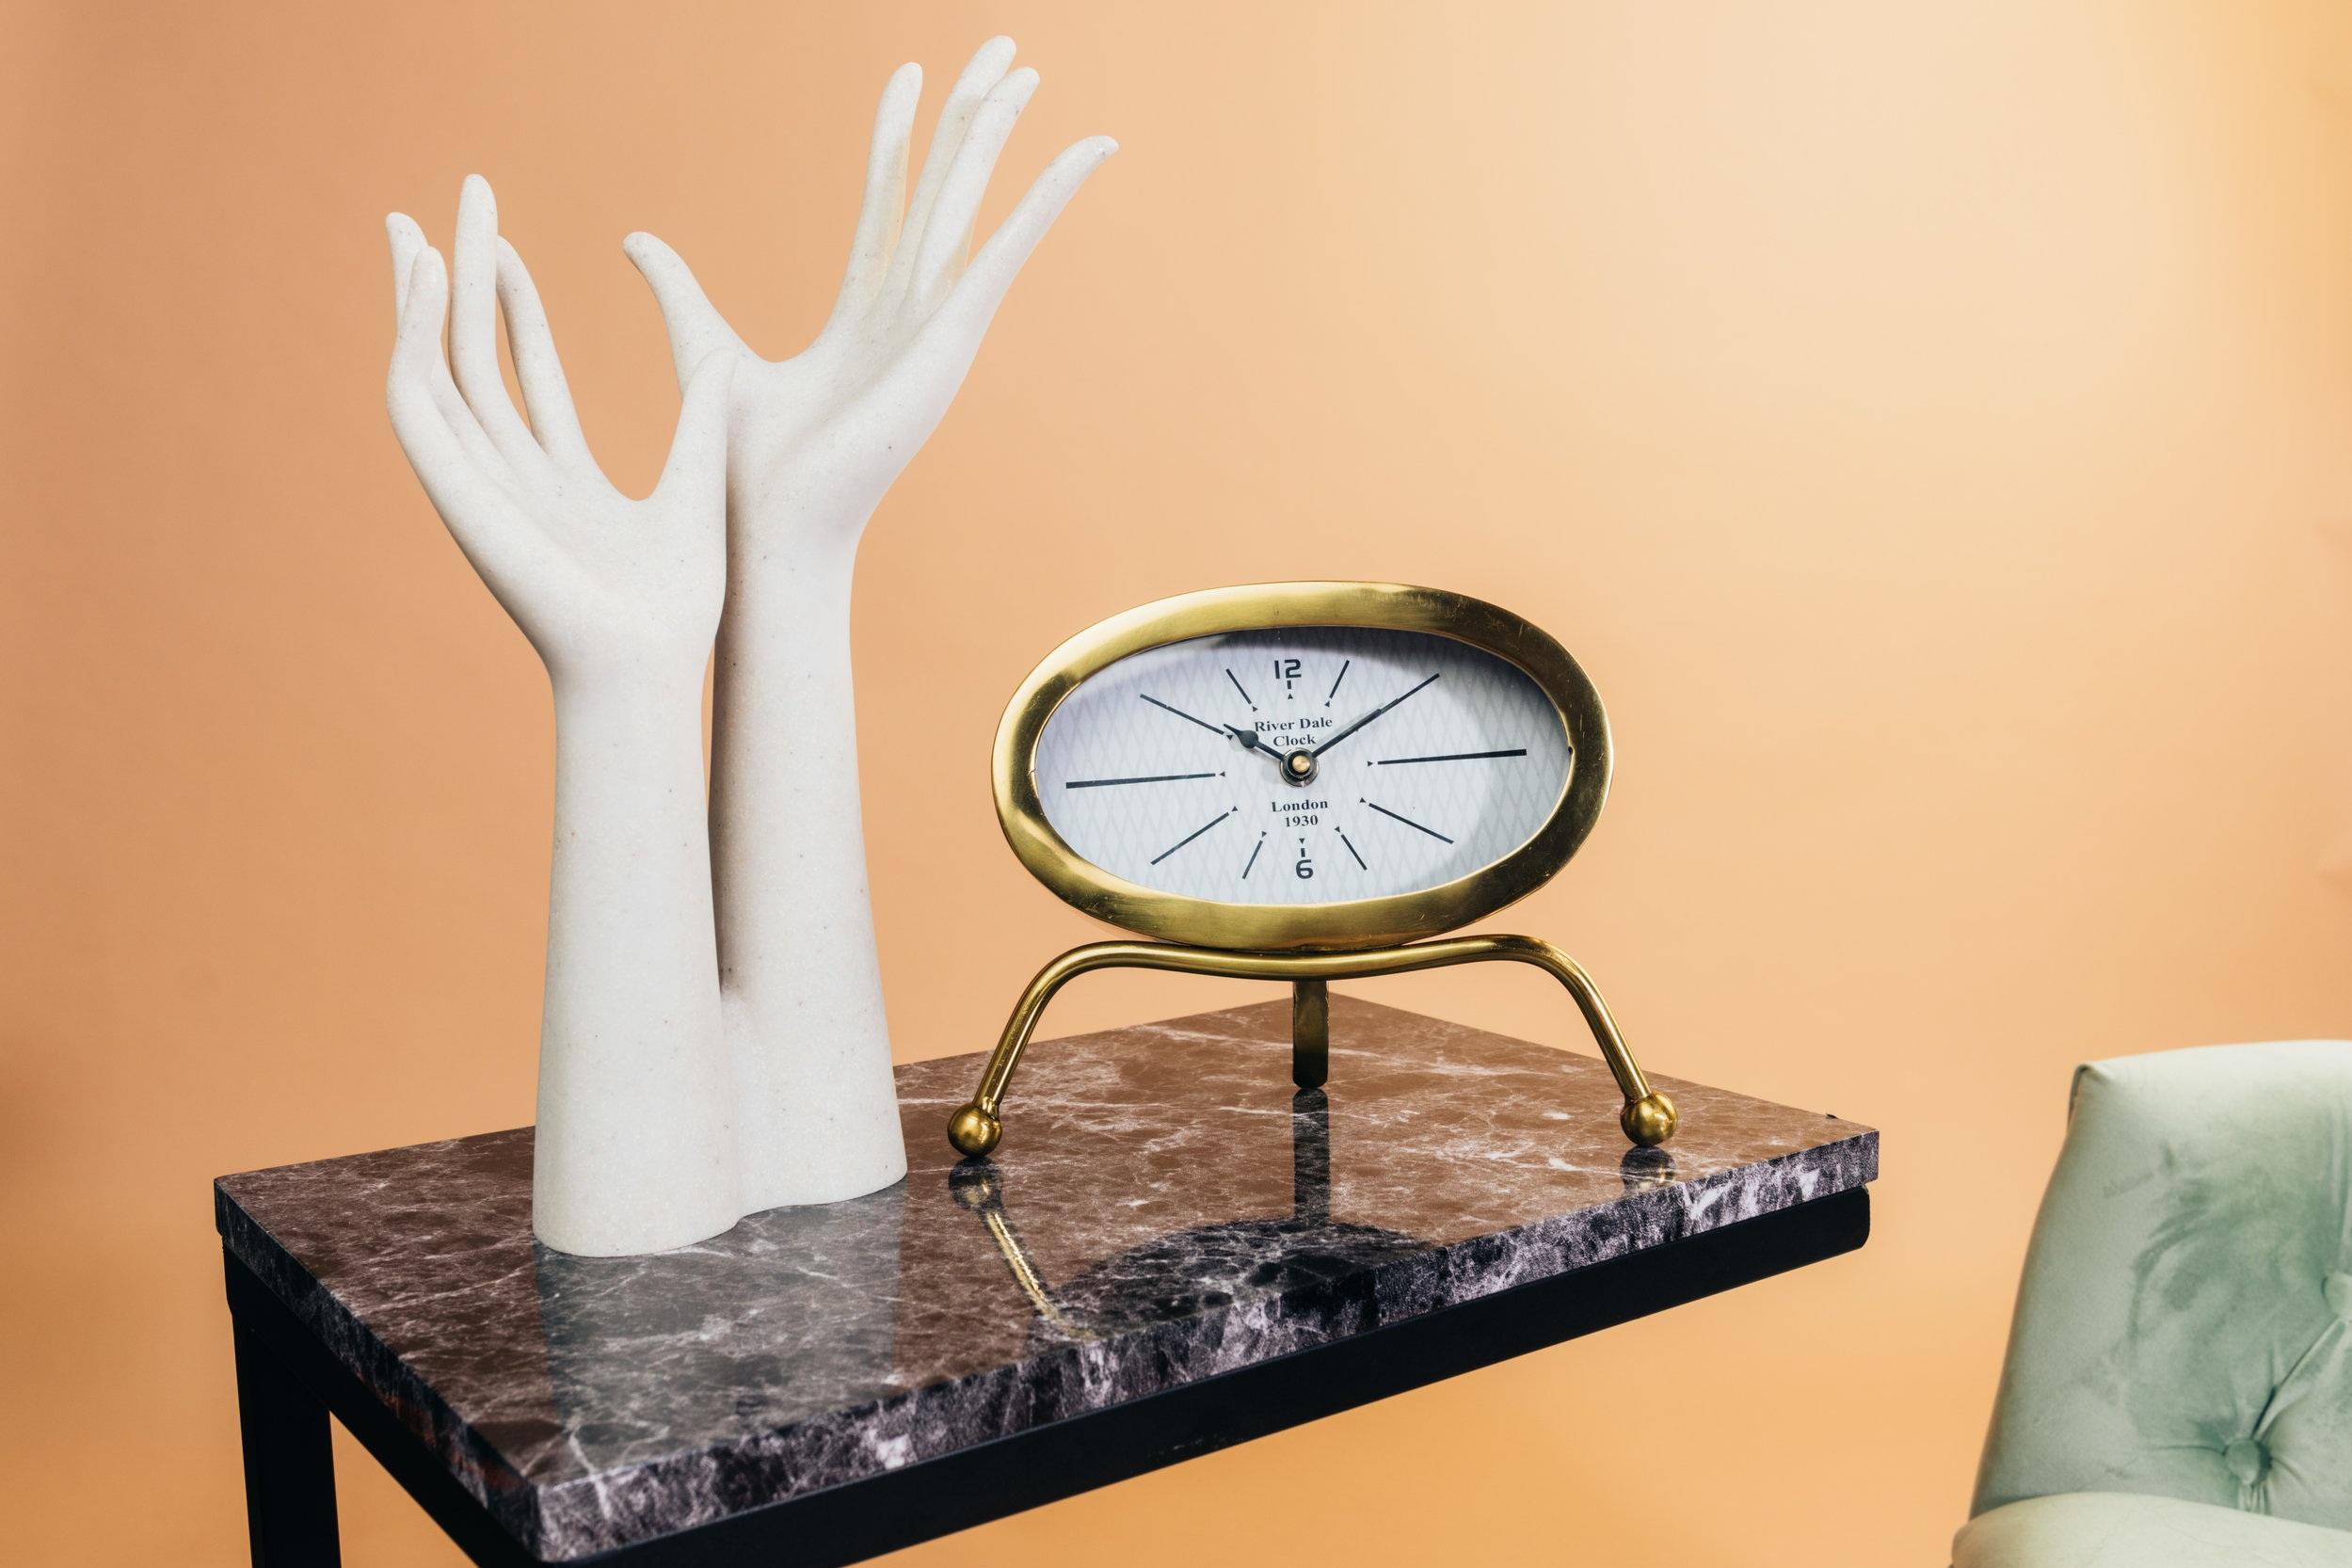 a persistent illusion // may 2019 - art direction + wardrobe: dallise elliott // photographer: ryder brooks // set design: piera moore // model: leigh johnson